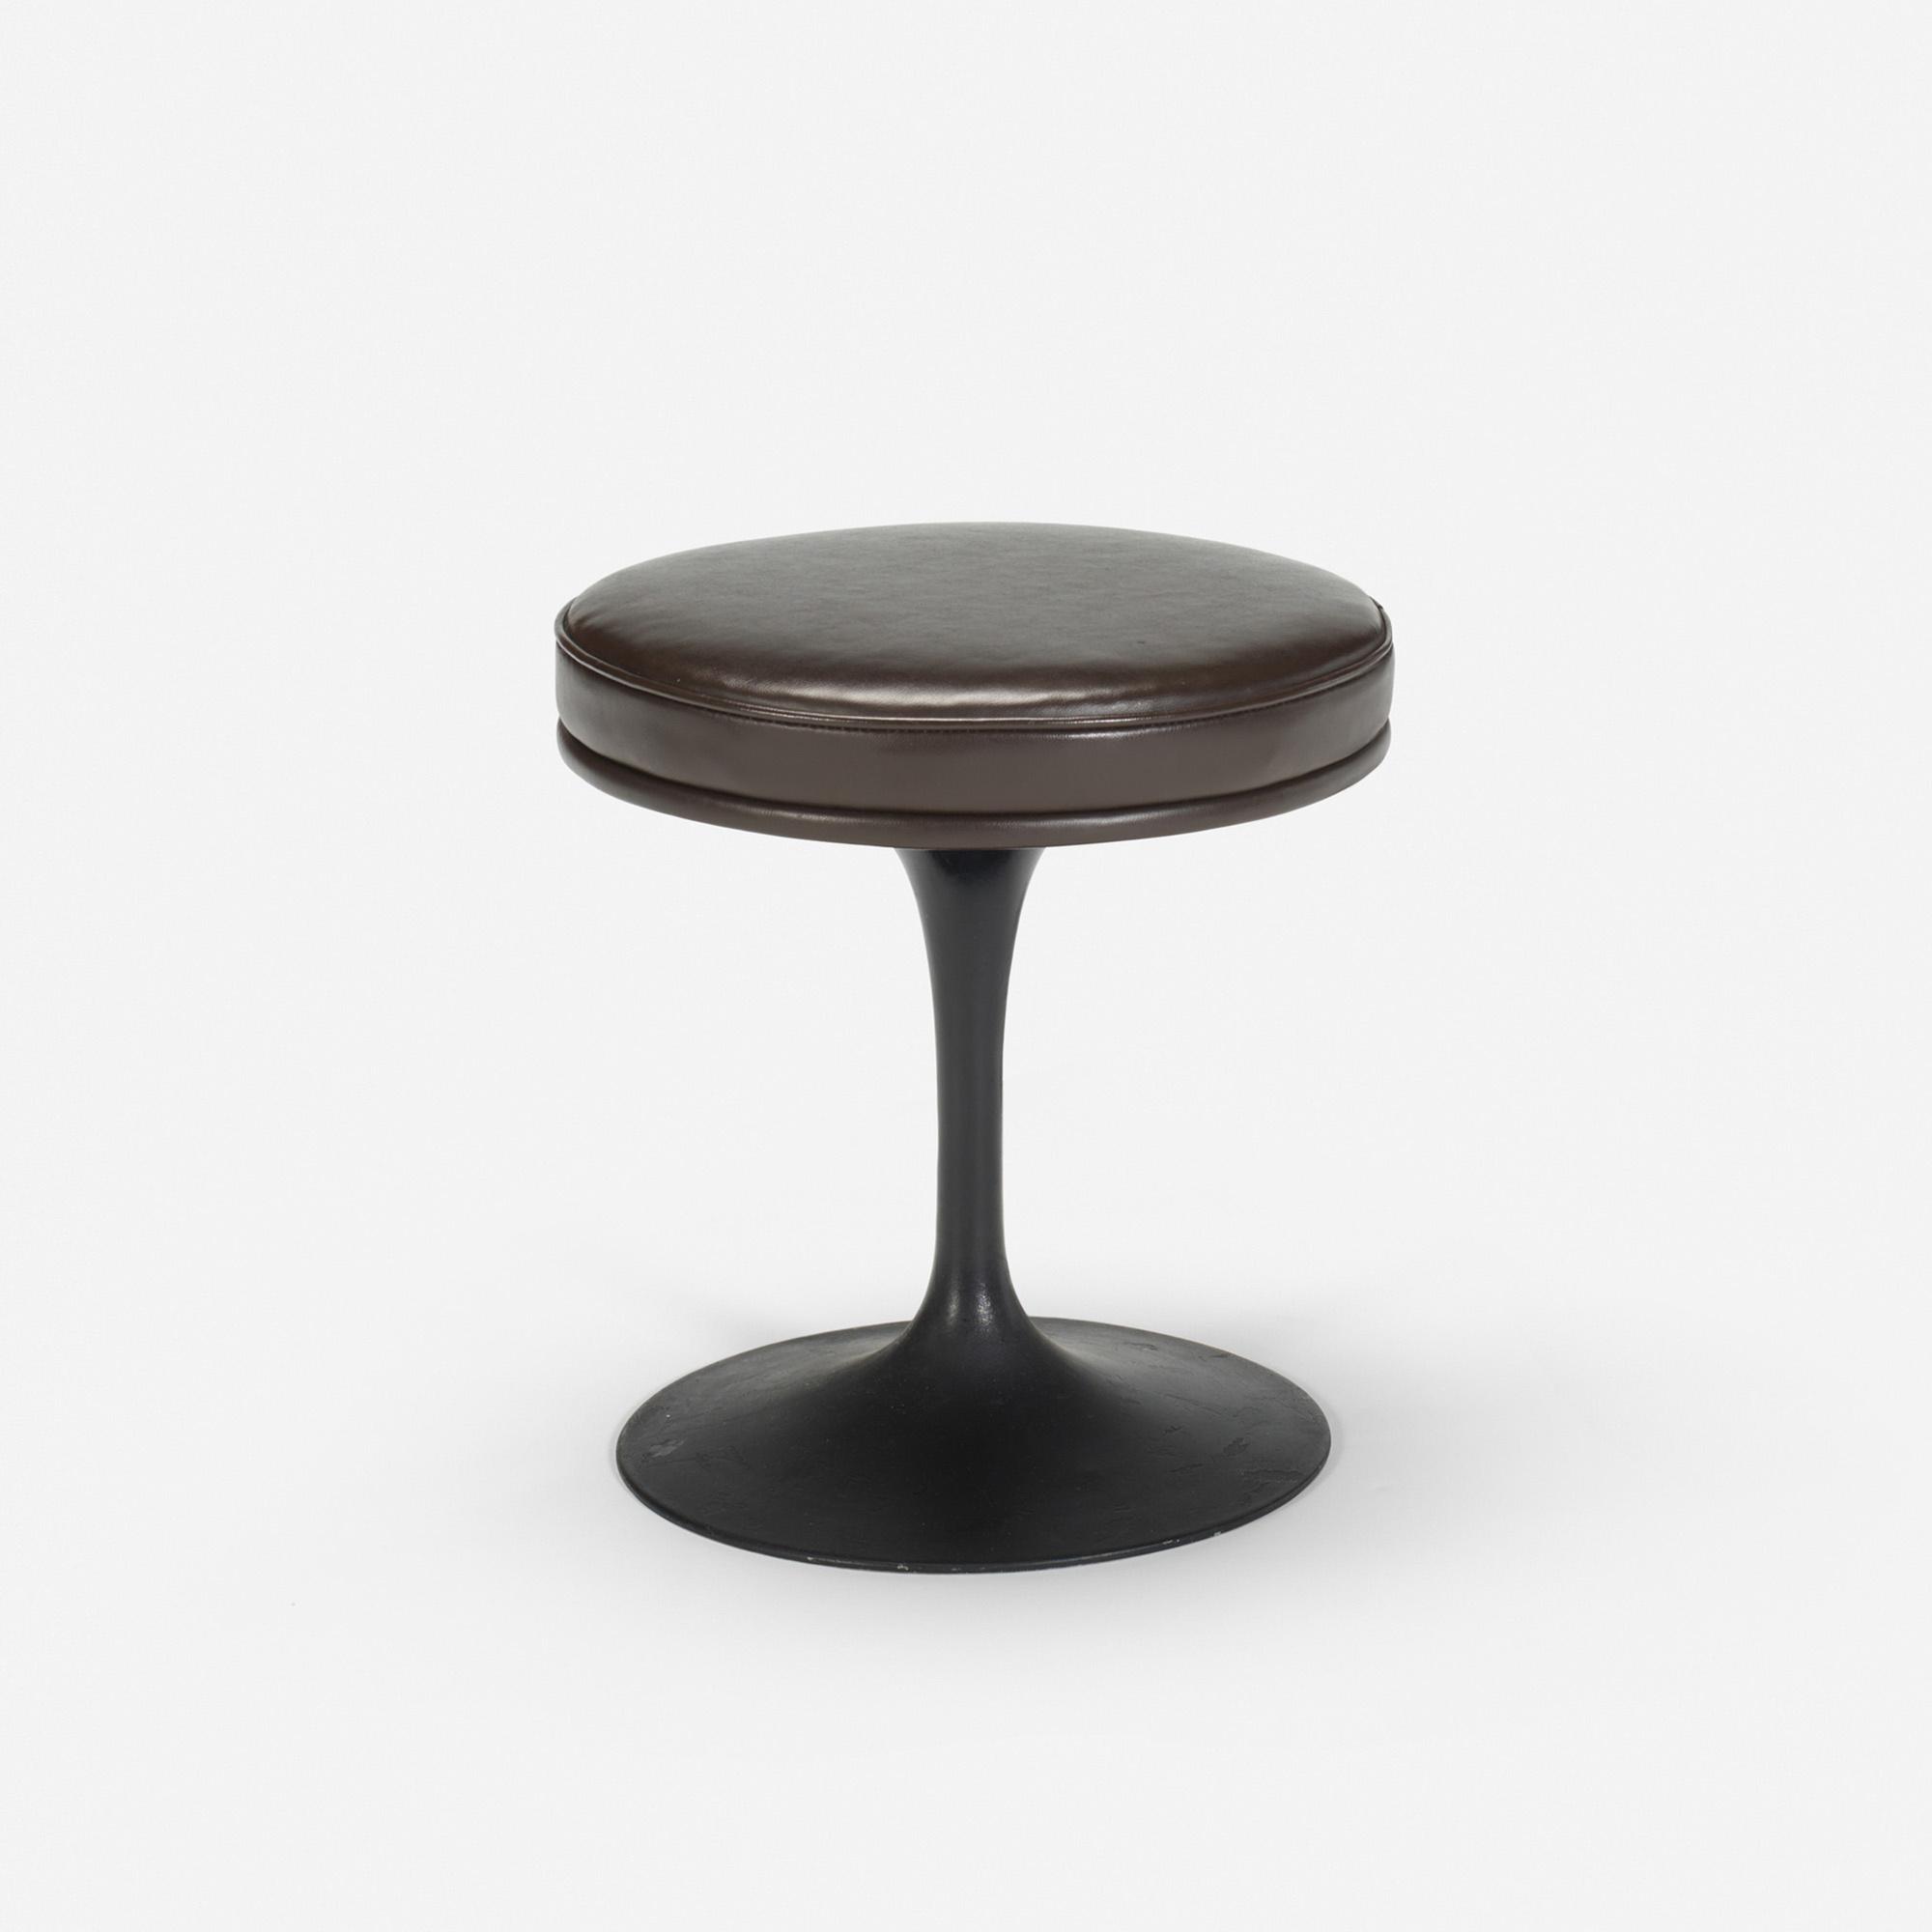 135: Eero Saarinen / Tulip stool from the bar of the Grill Room (1 of 1)